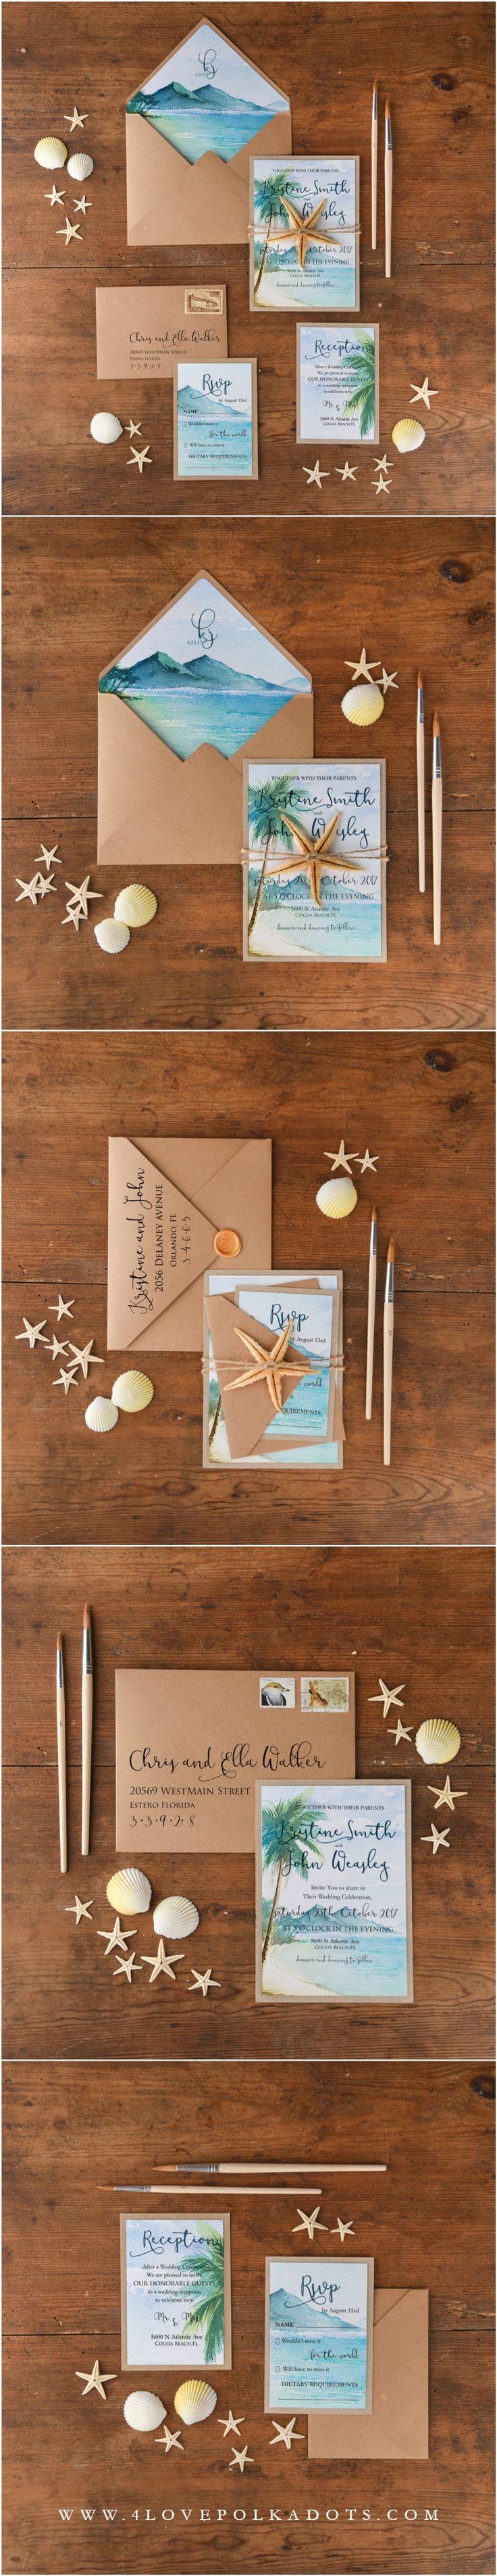 Beach Wedding Invitations with Starfish #beachwedding #sea #starfish #watercolor #destinationwedding